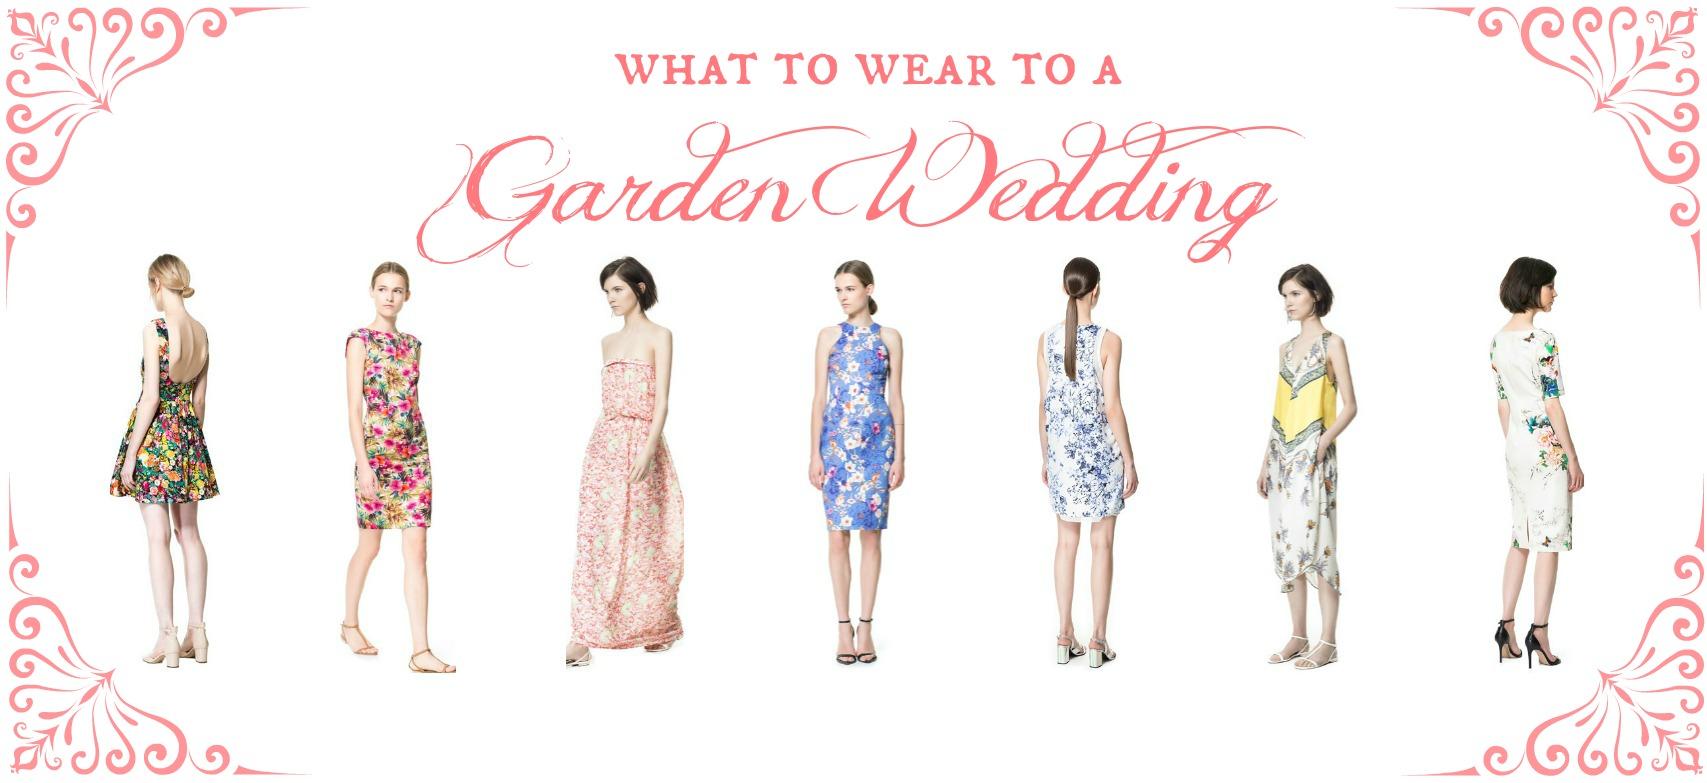 What to Wear to A Garden Wedding | Zara Floral Dress